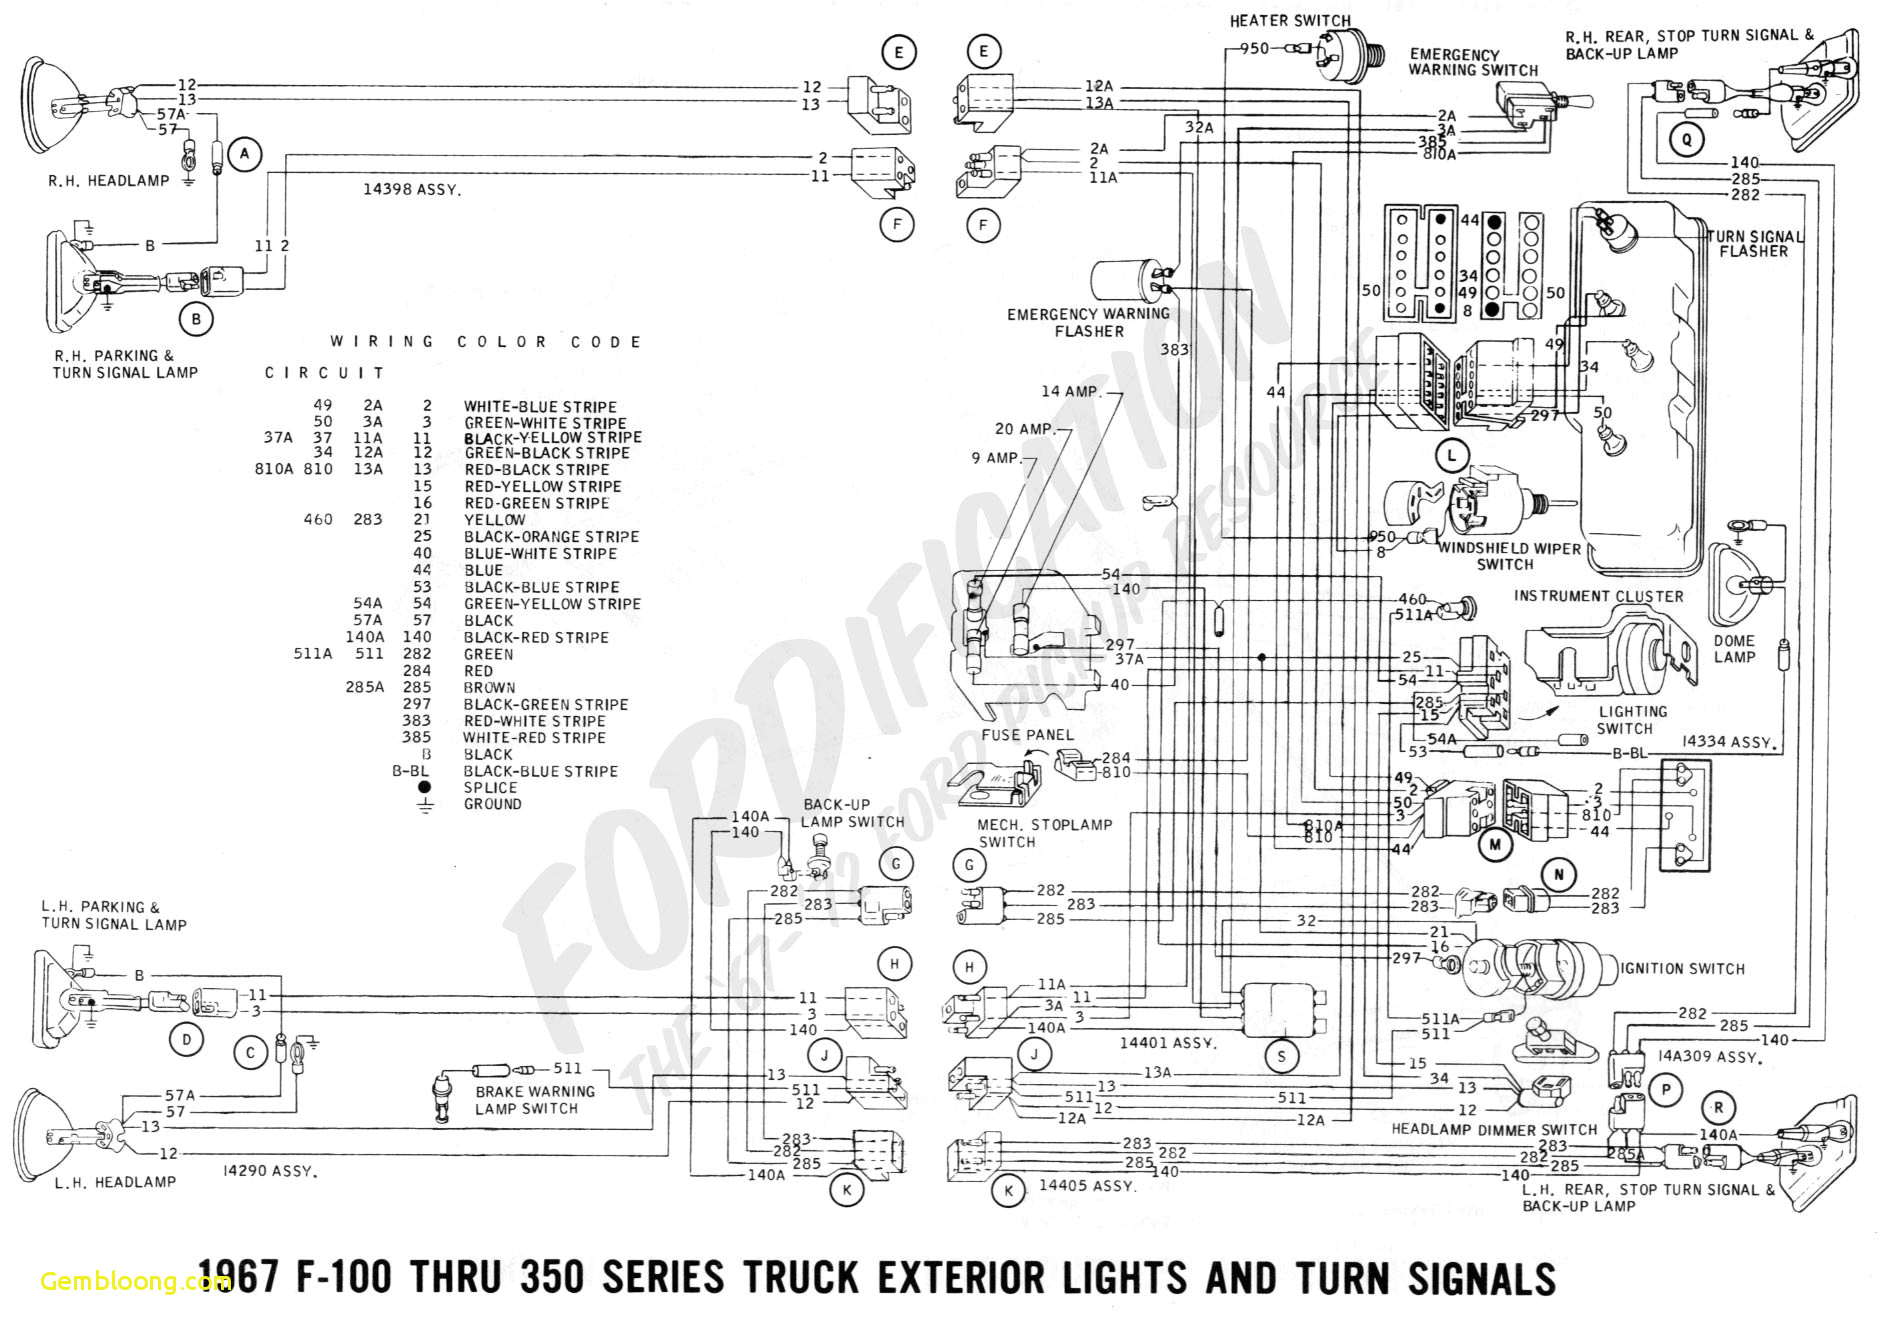 s40 wiring diagrams free wiring diagram on wiring diagram schematic cat5jackwiringdiagramrcacat5wallplatewiringdiagram918x1014